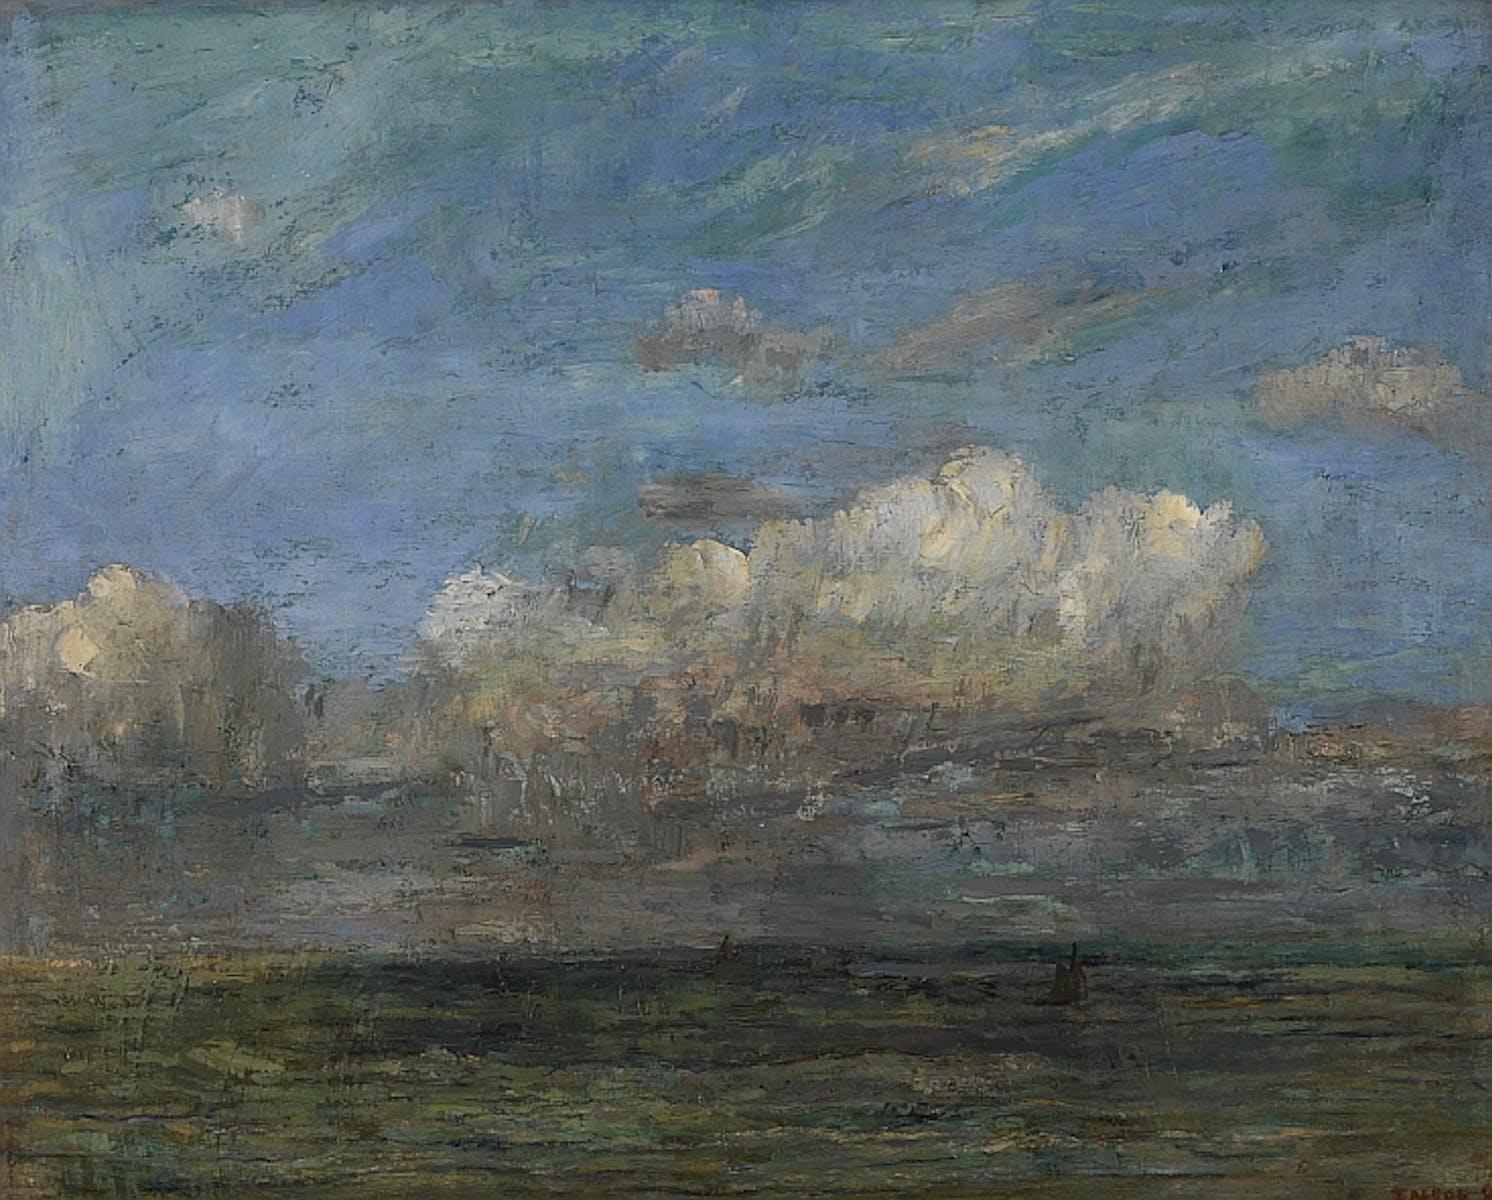 James Ensor, The White Cloud